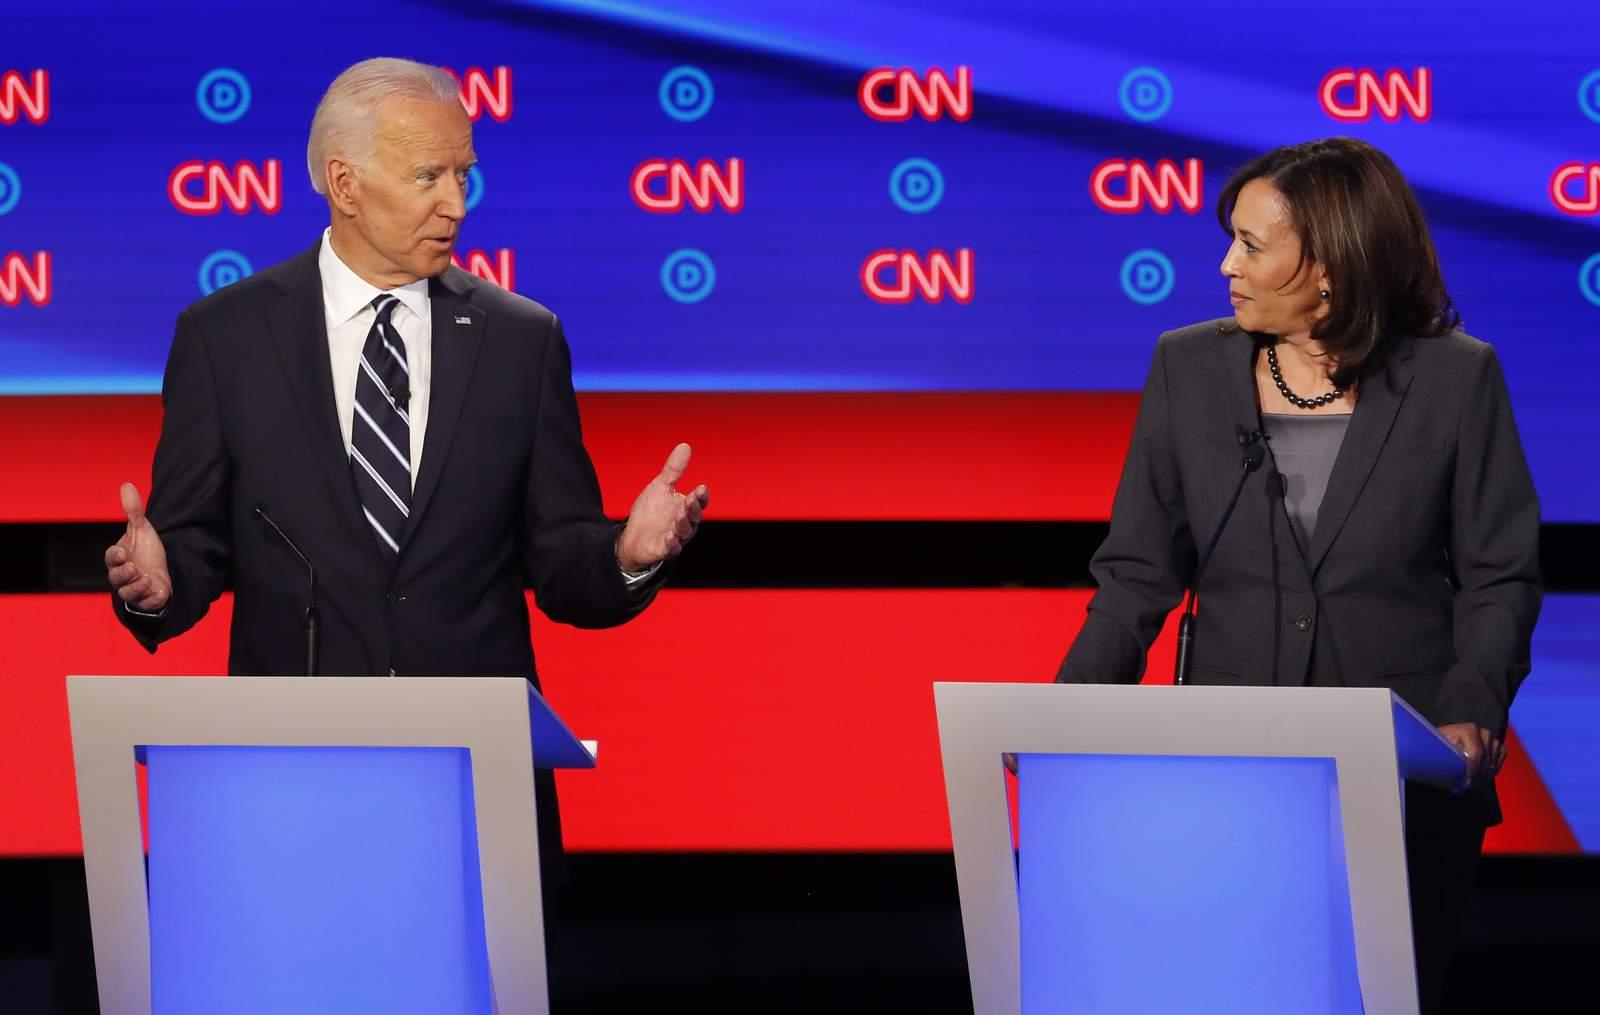 Virginia, U.S. officials react to Biden picking Kamala Harris as VP